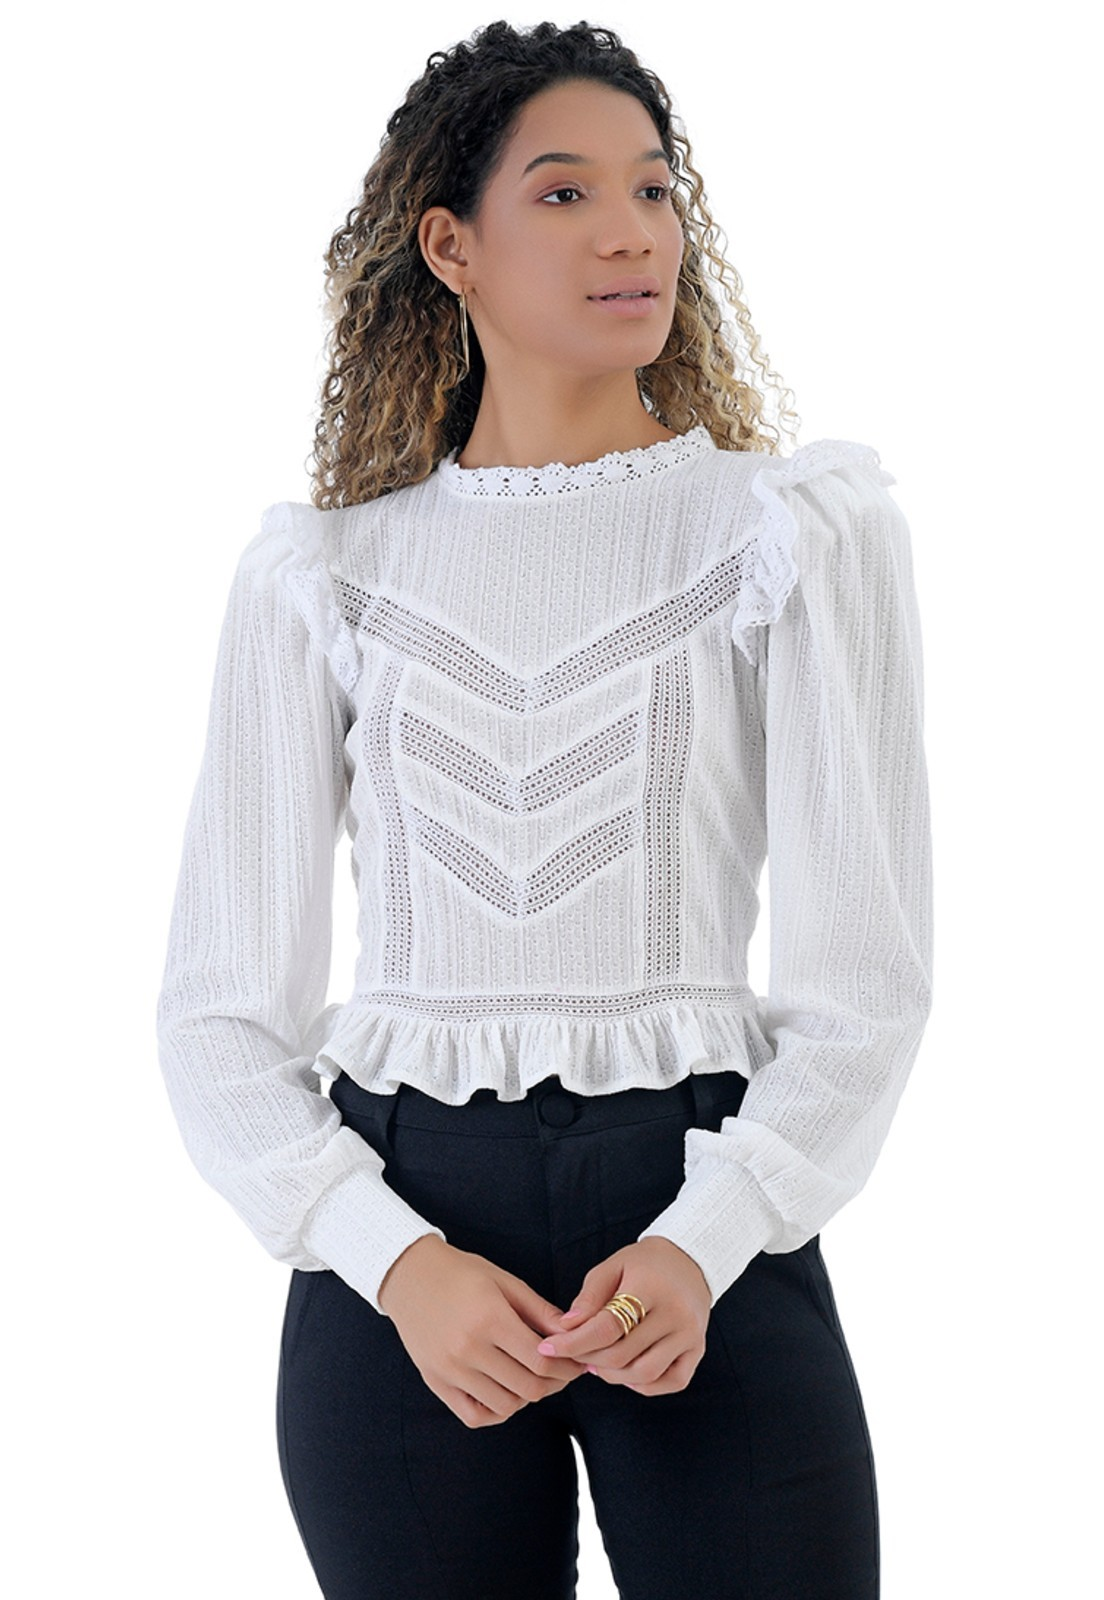 Blusa de malha tricot